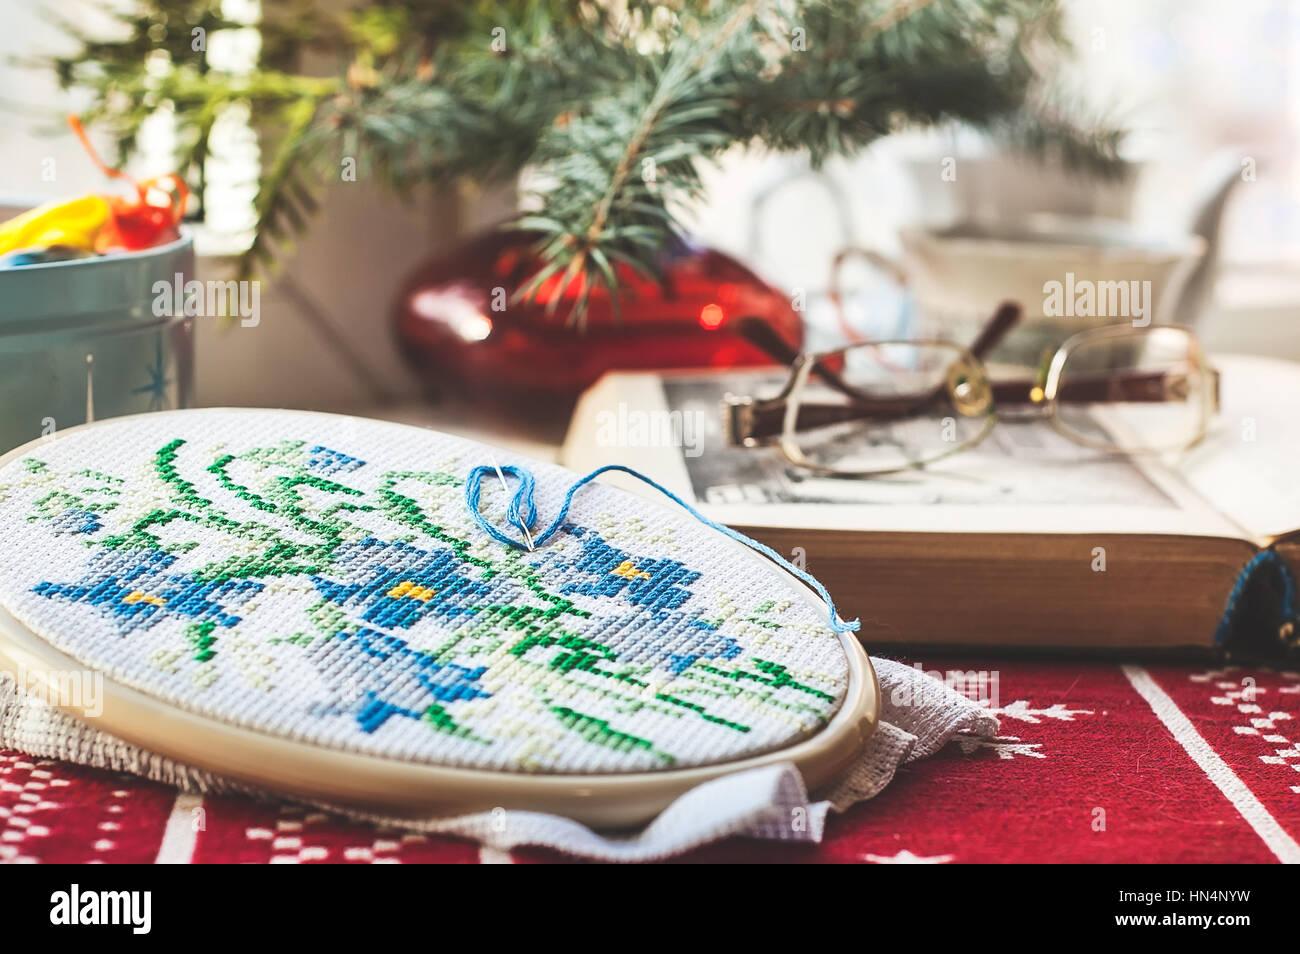 Christmas Cross Stitch Stockfotos & Christmas Cross Stitch Bilder ...